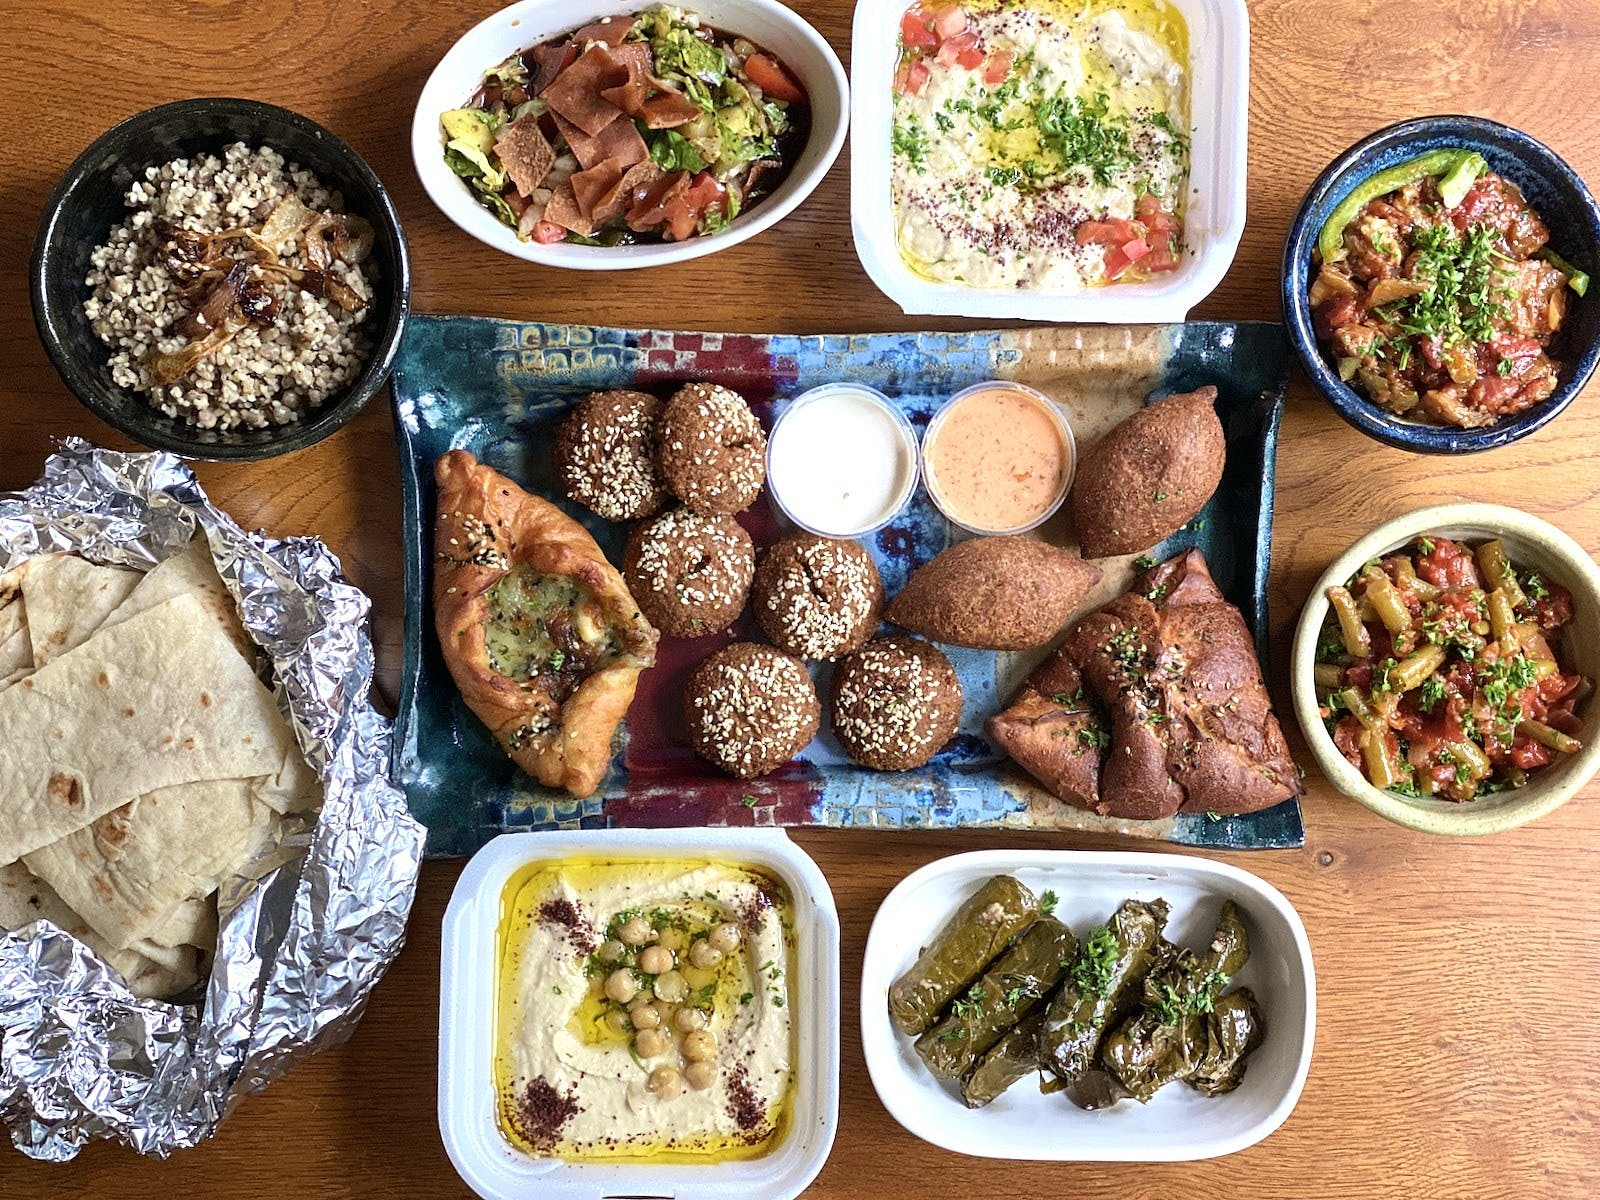 Damascus Gate Restaurant in Milwaukee - Highlight